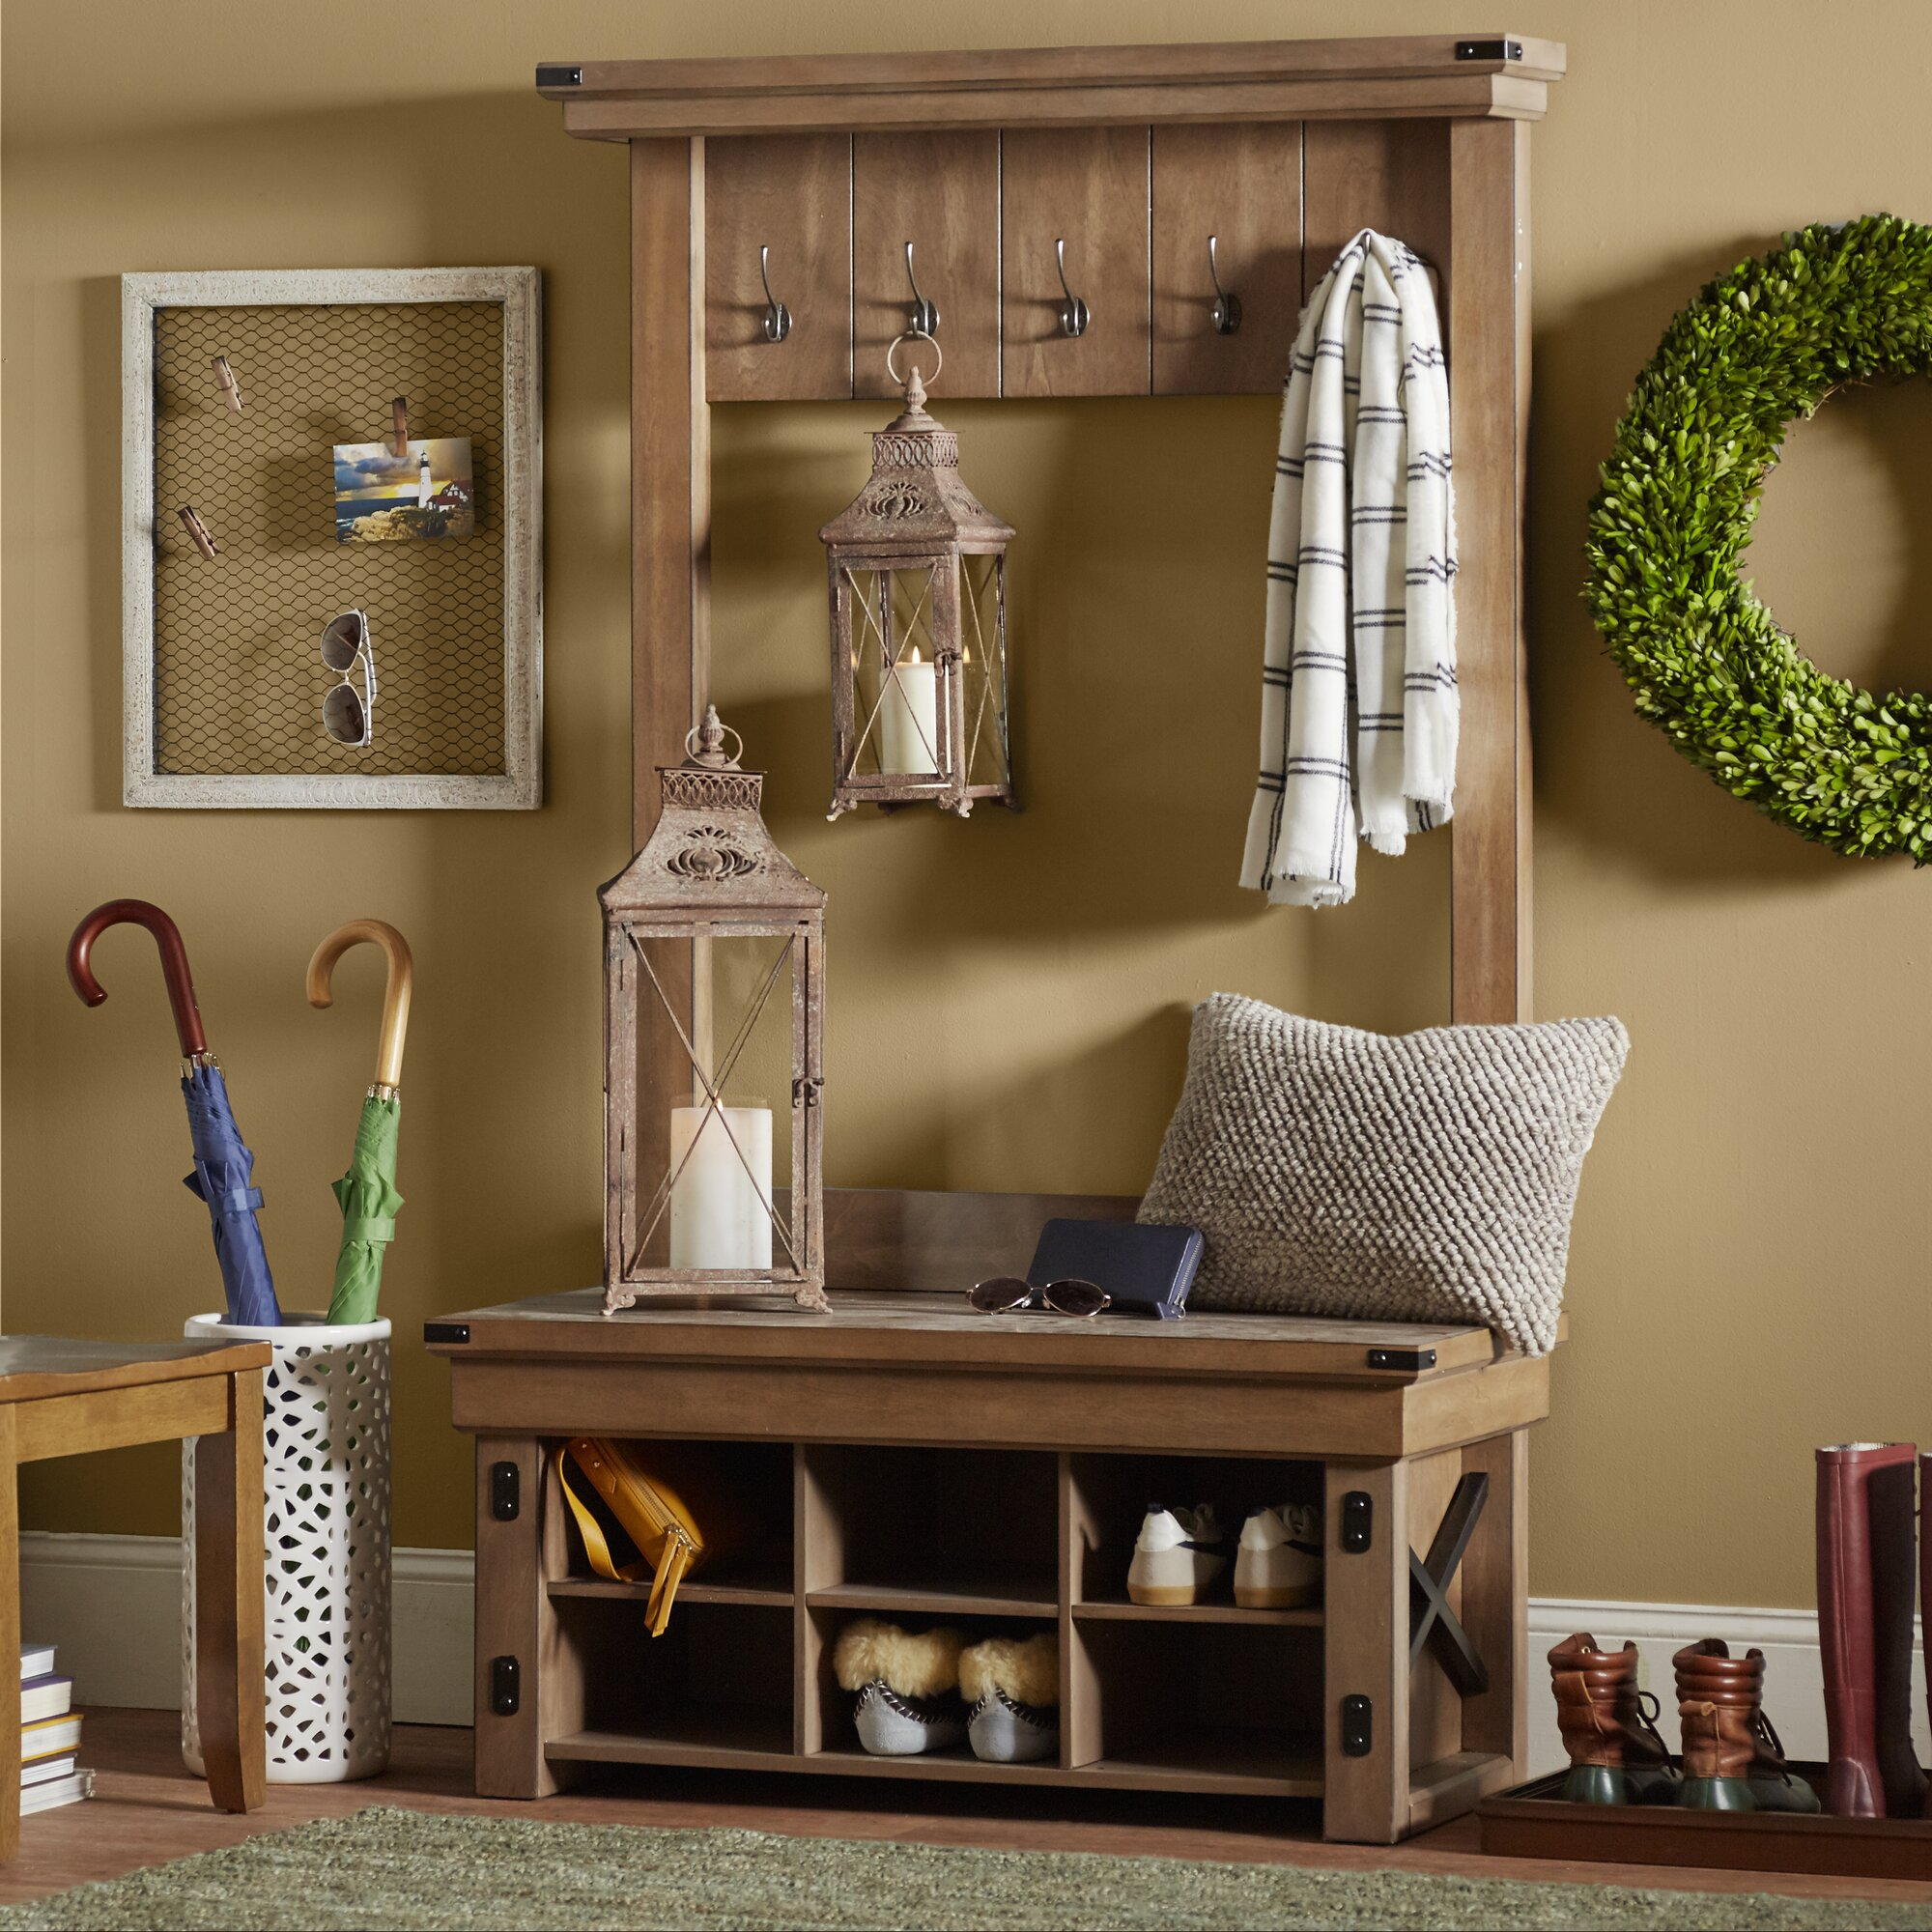 Foyer Mudroom Reviews : August grove irwin wood veneer entryway hall tree with